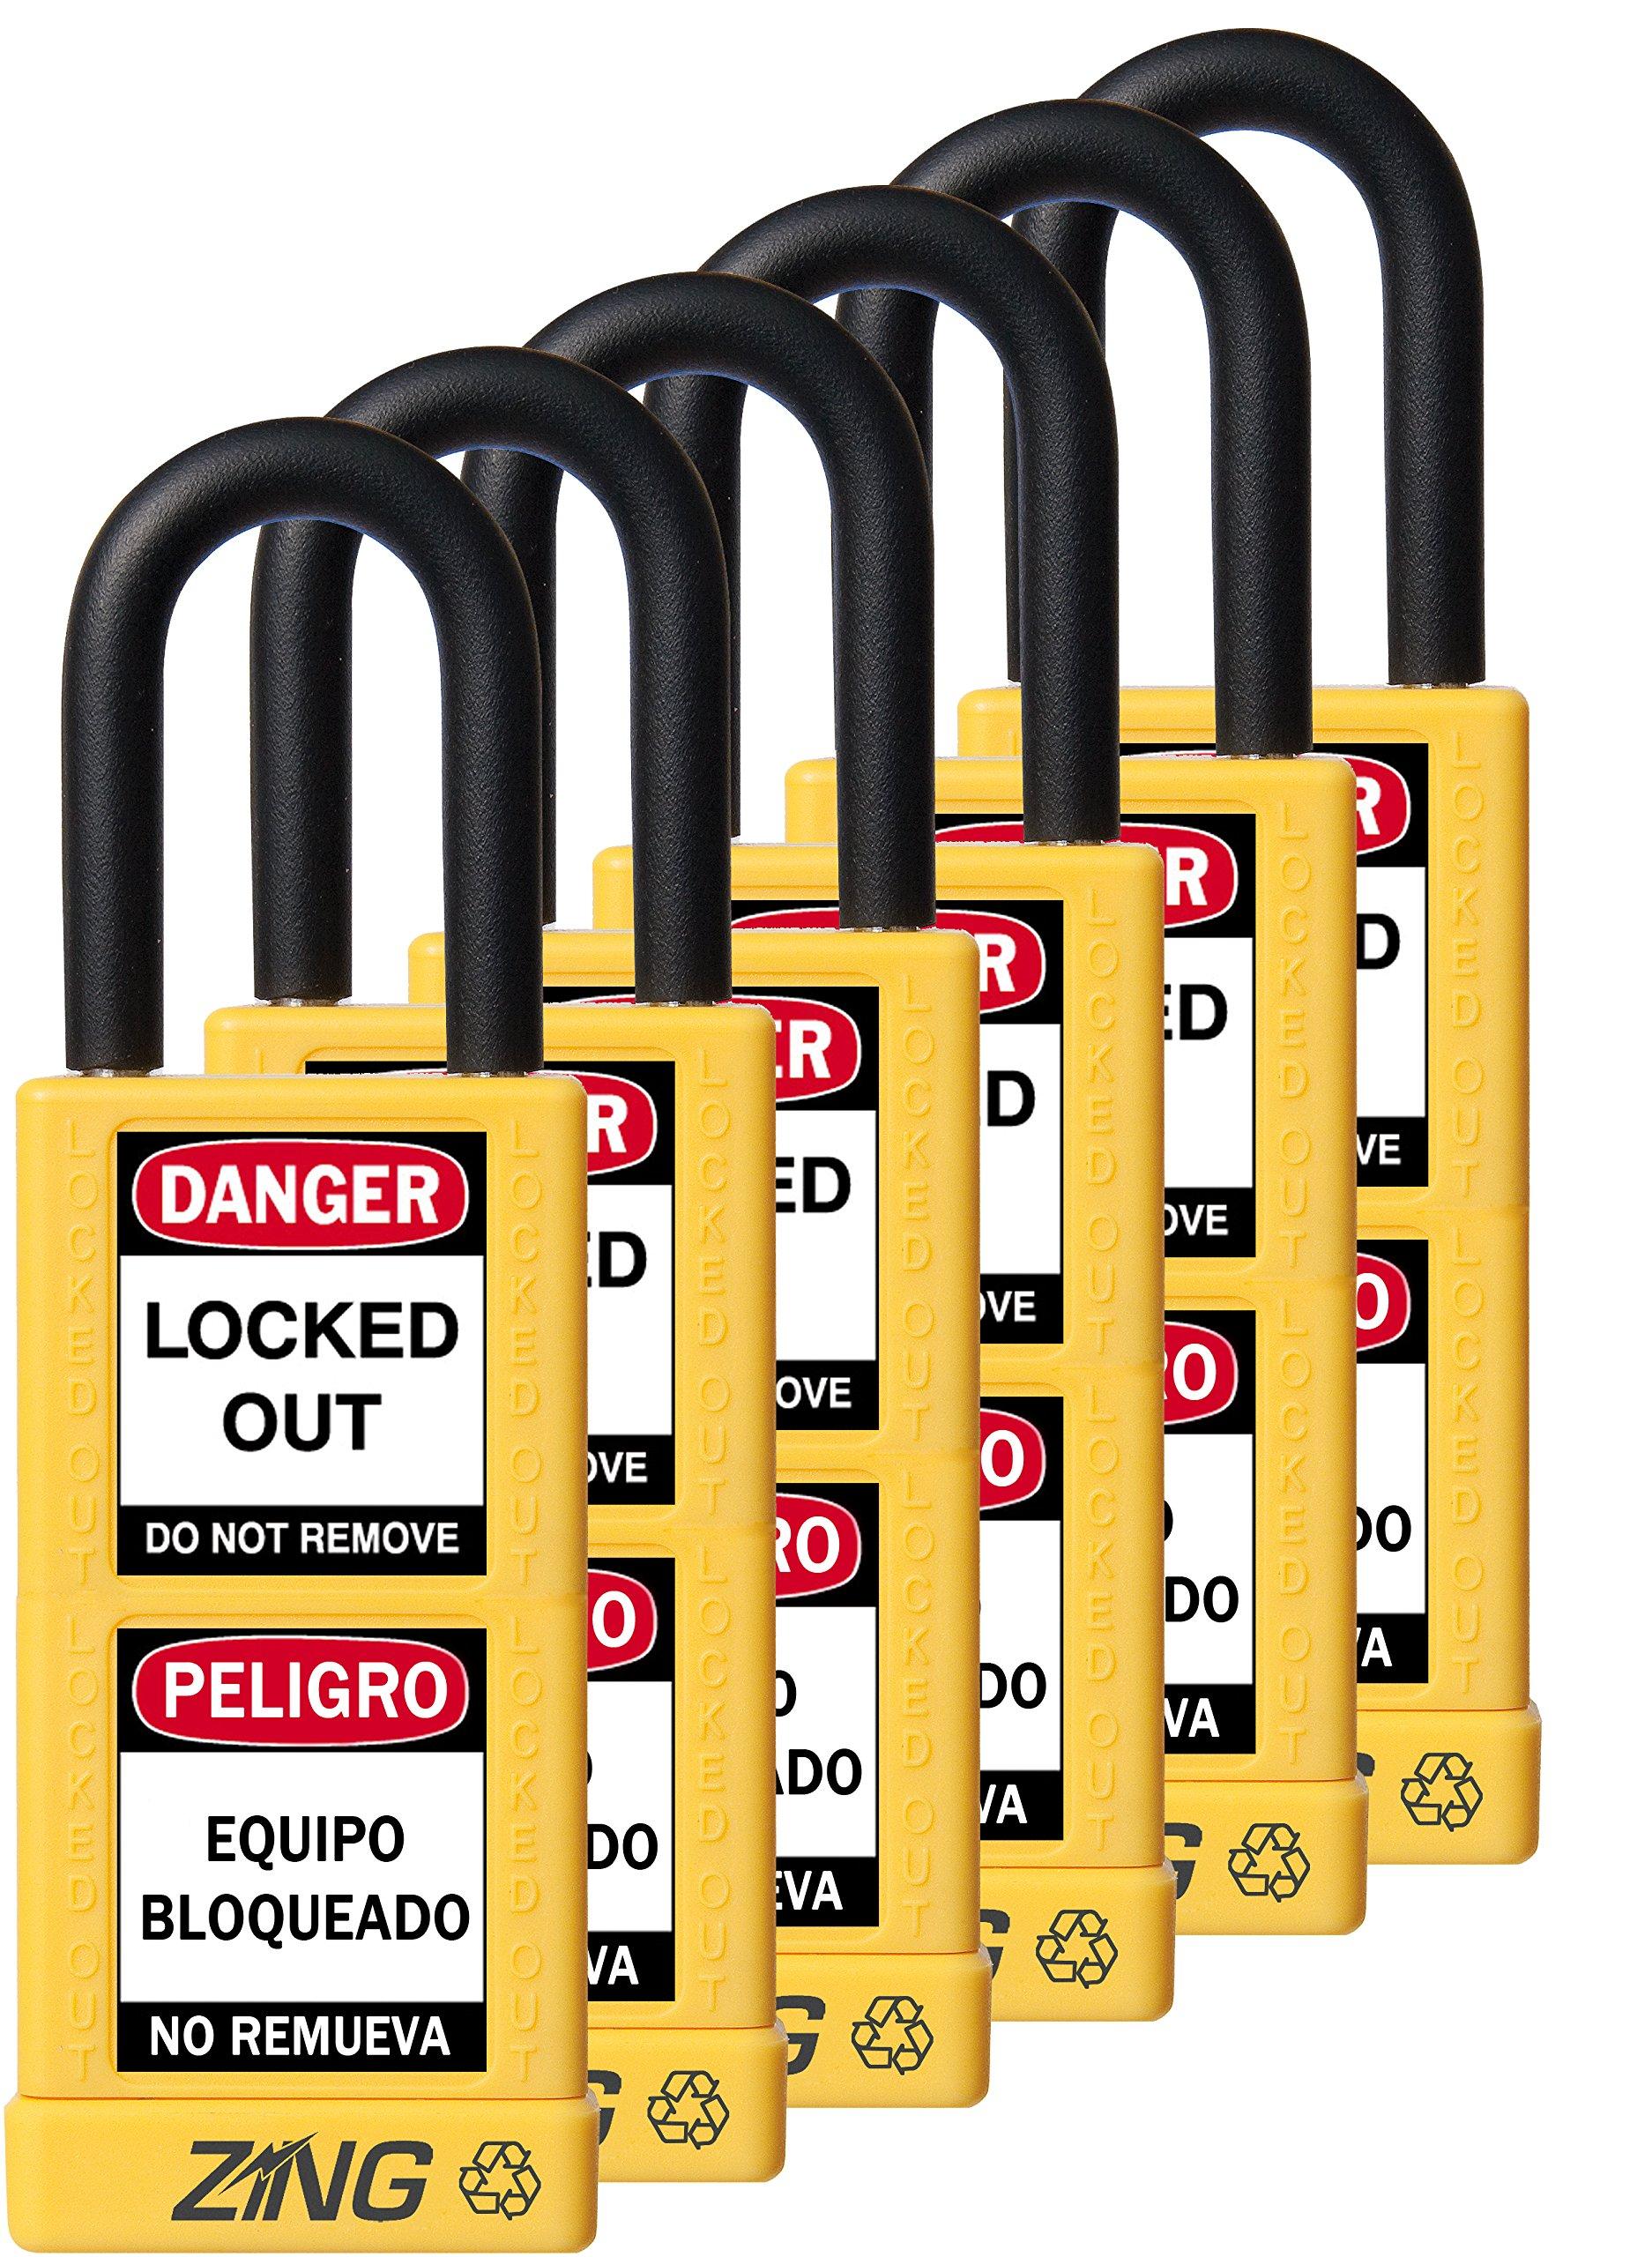 ZING 7093 RecycLock Safety Padlock, Keyed Alike,1-1/2'' Shackle, 3'' Long Body, Yellow, 6 Pack